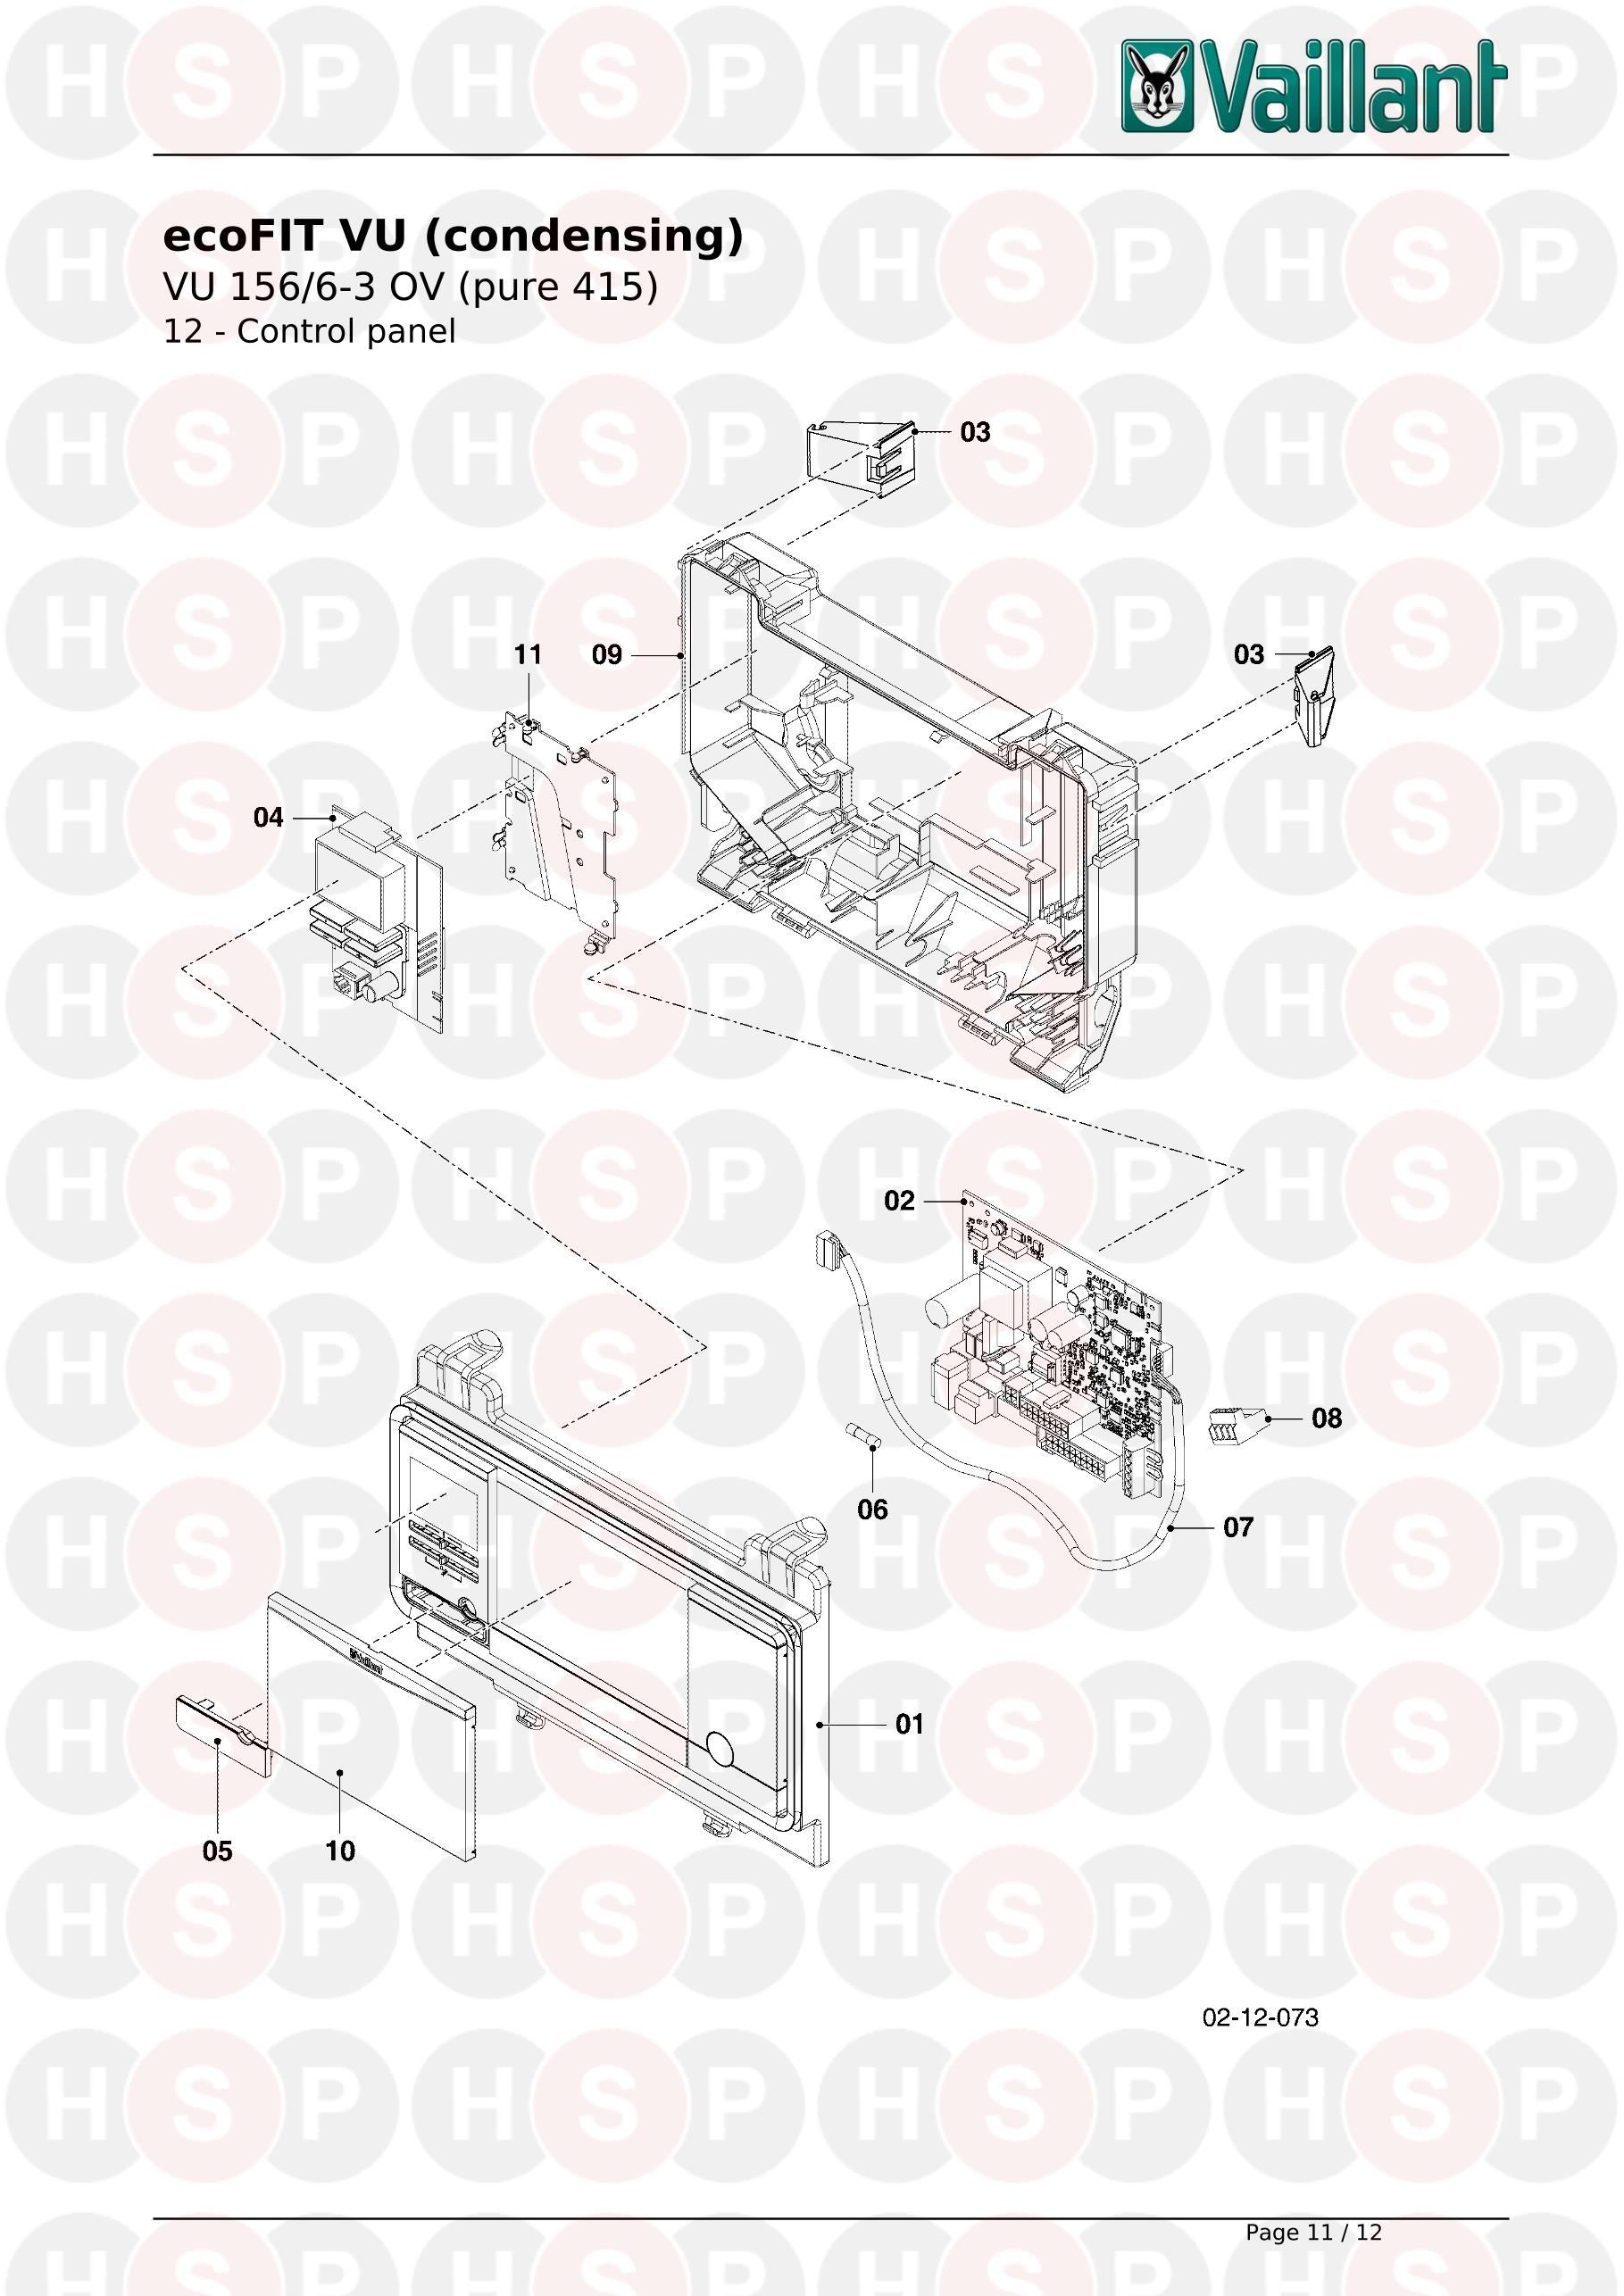 Vaillant ECOFIT PURE 415 VU 156/6-3 OV (H-GB) (12 CONTROL